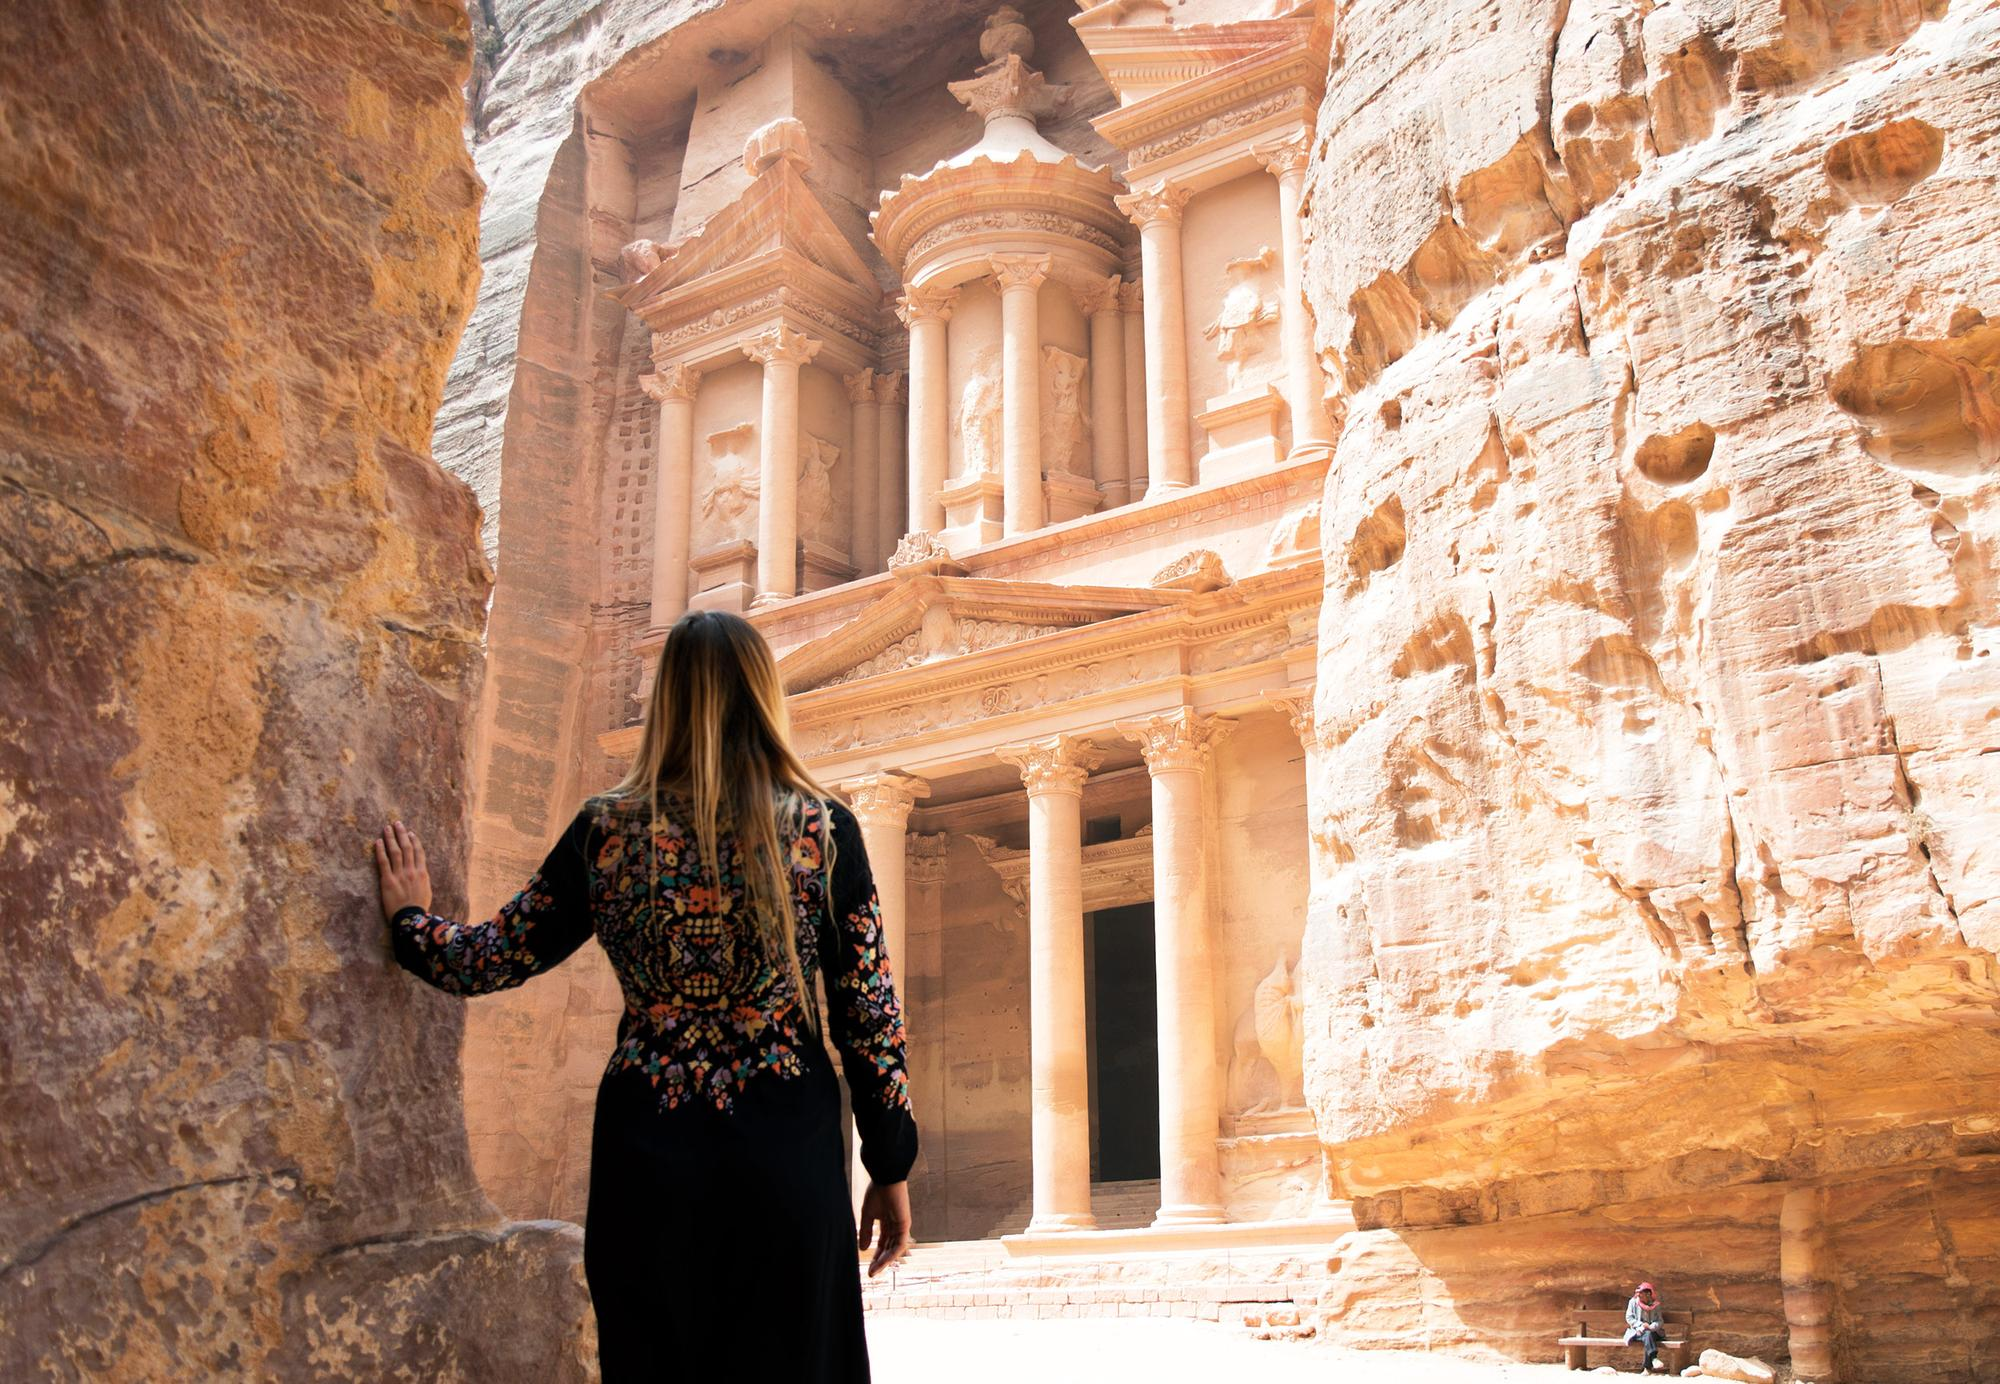 Image L'envoûtante Petra, Jordanie